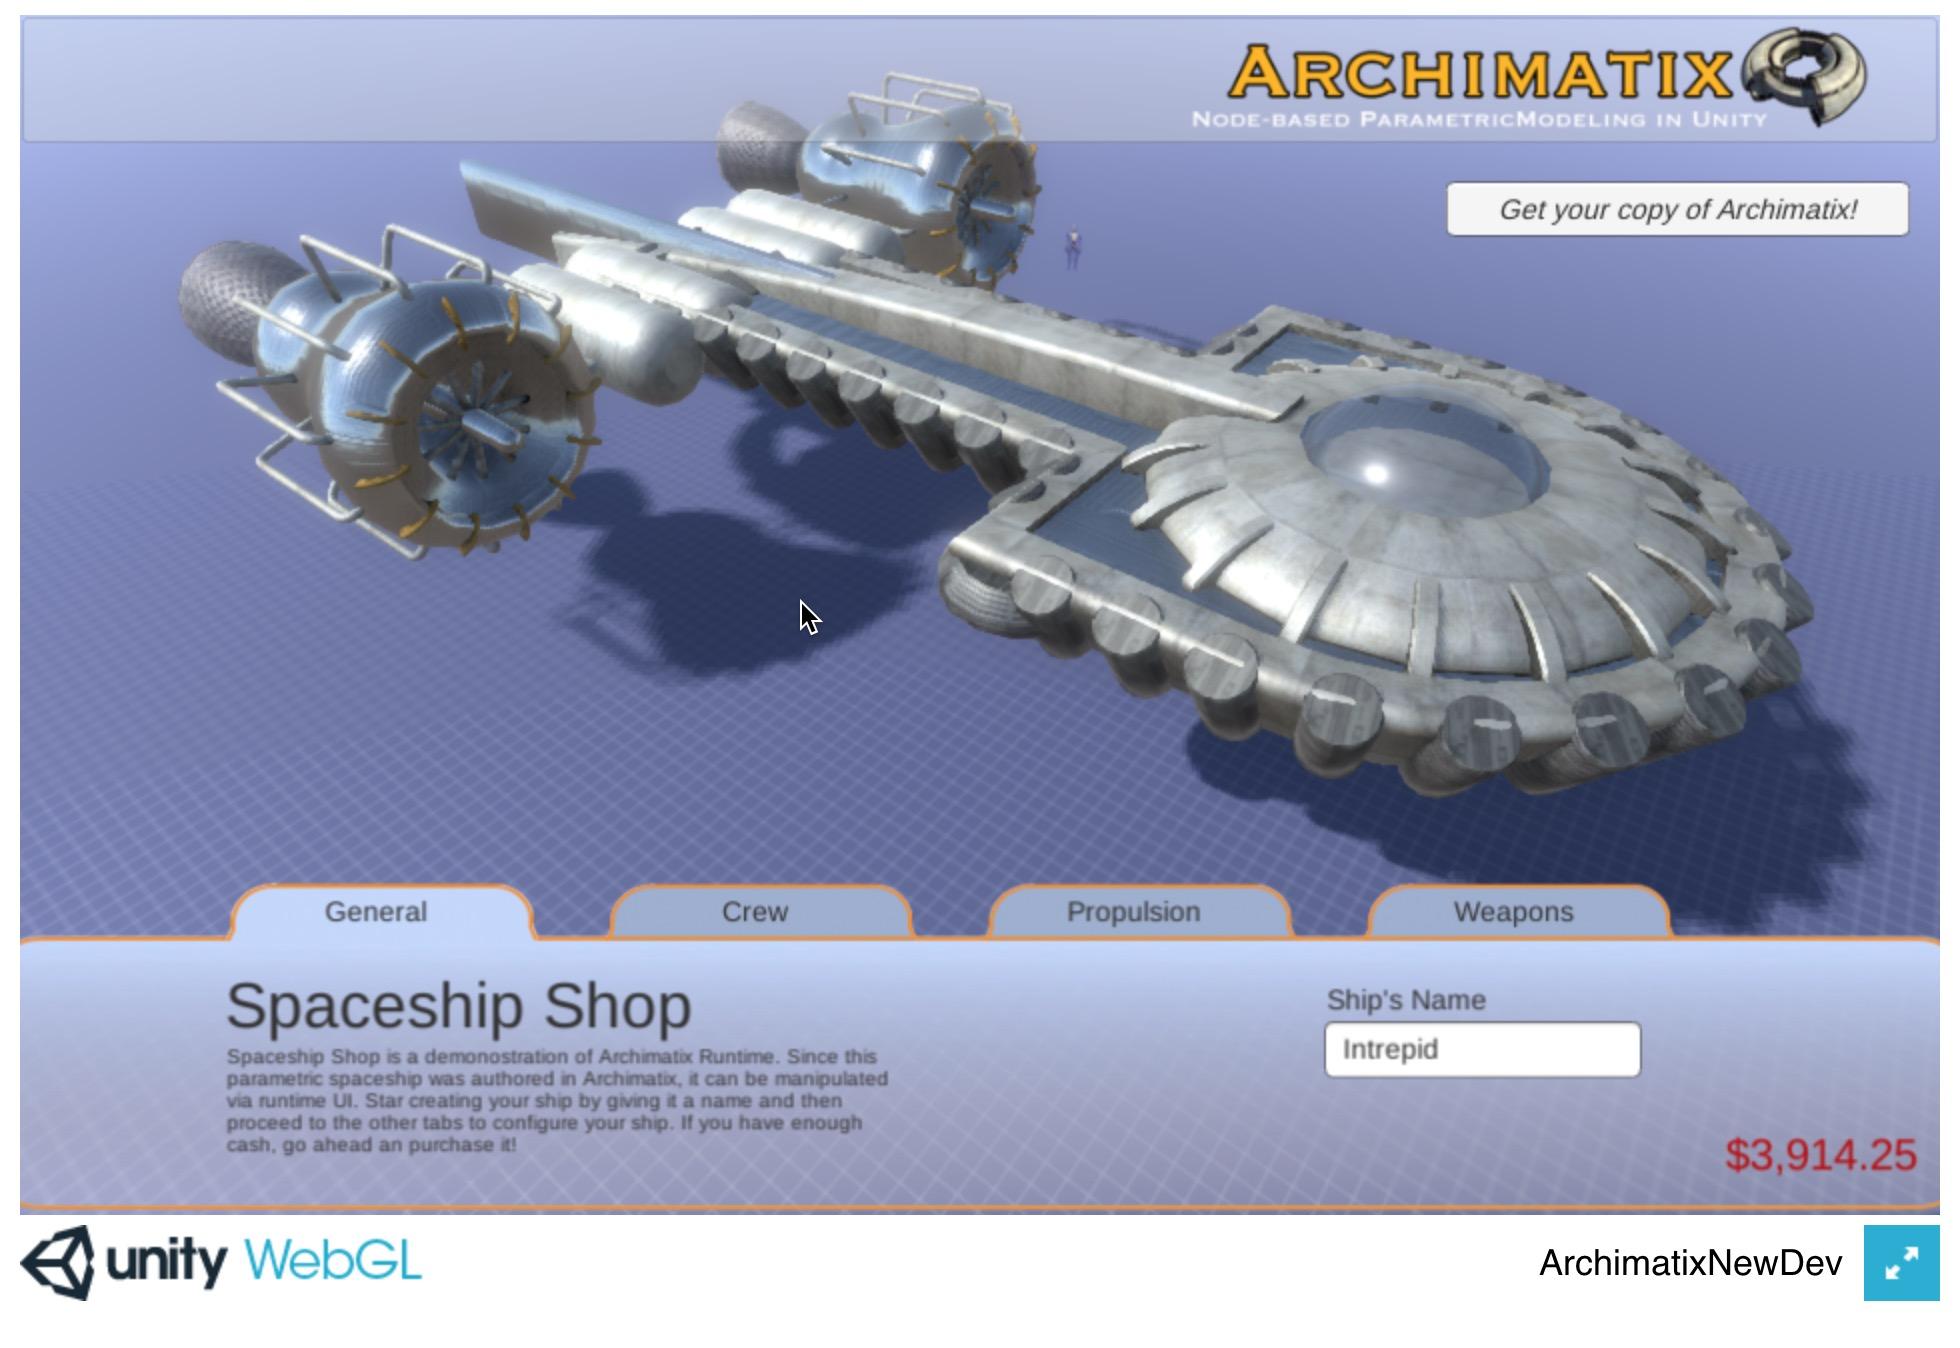 Archimatix 2017-06-08_08-31-35_PM.jpg